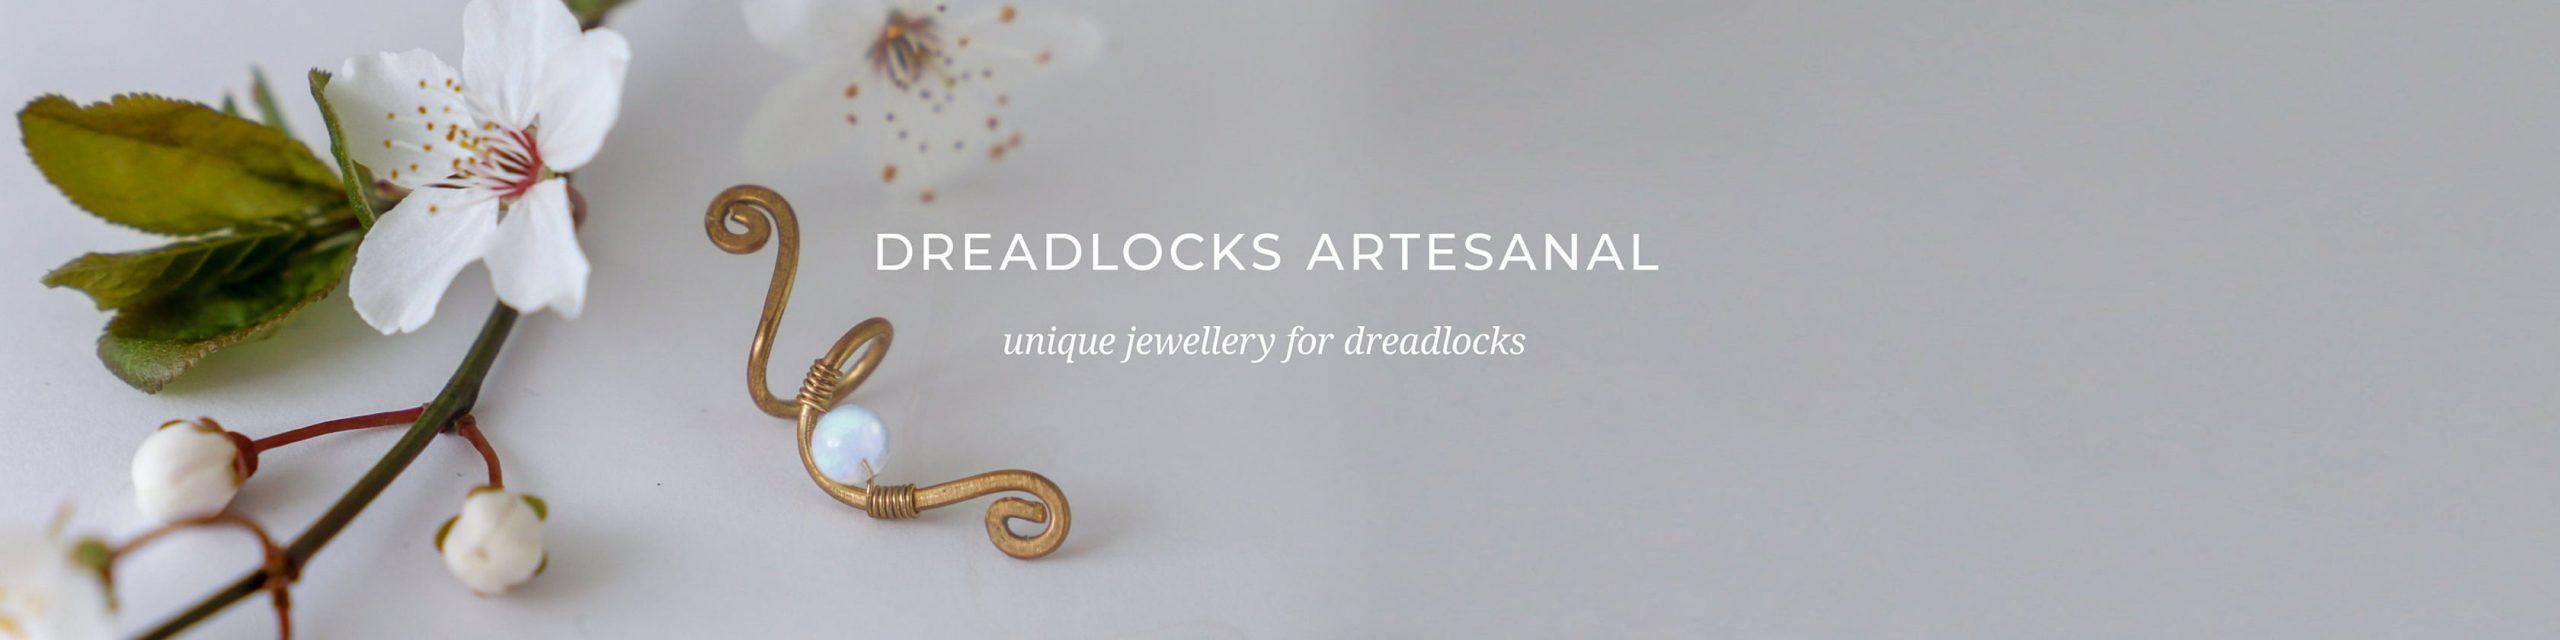 Dreadlocks Artesanal